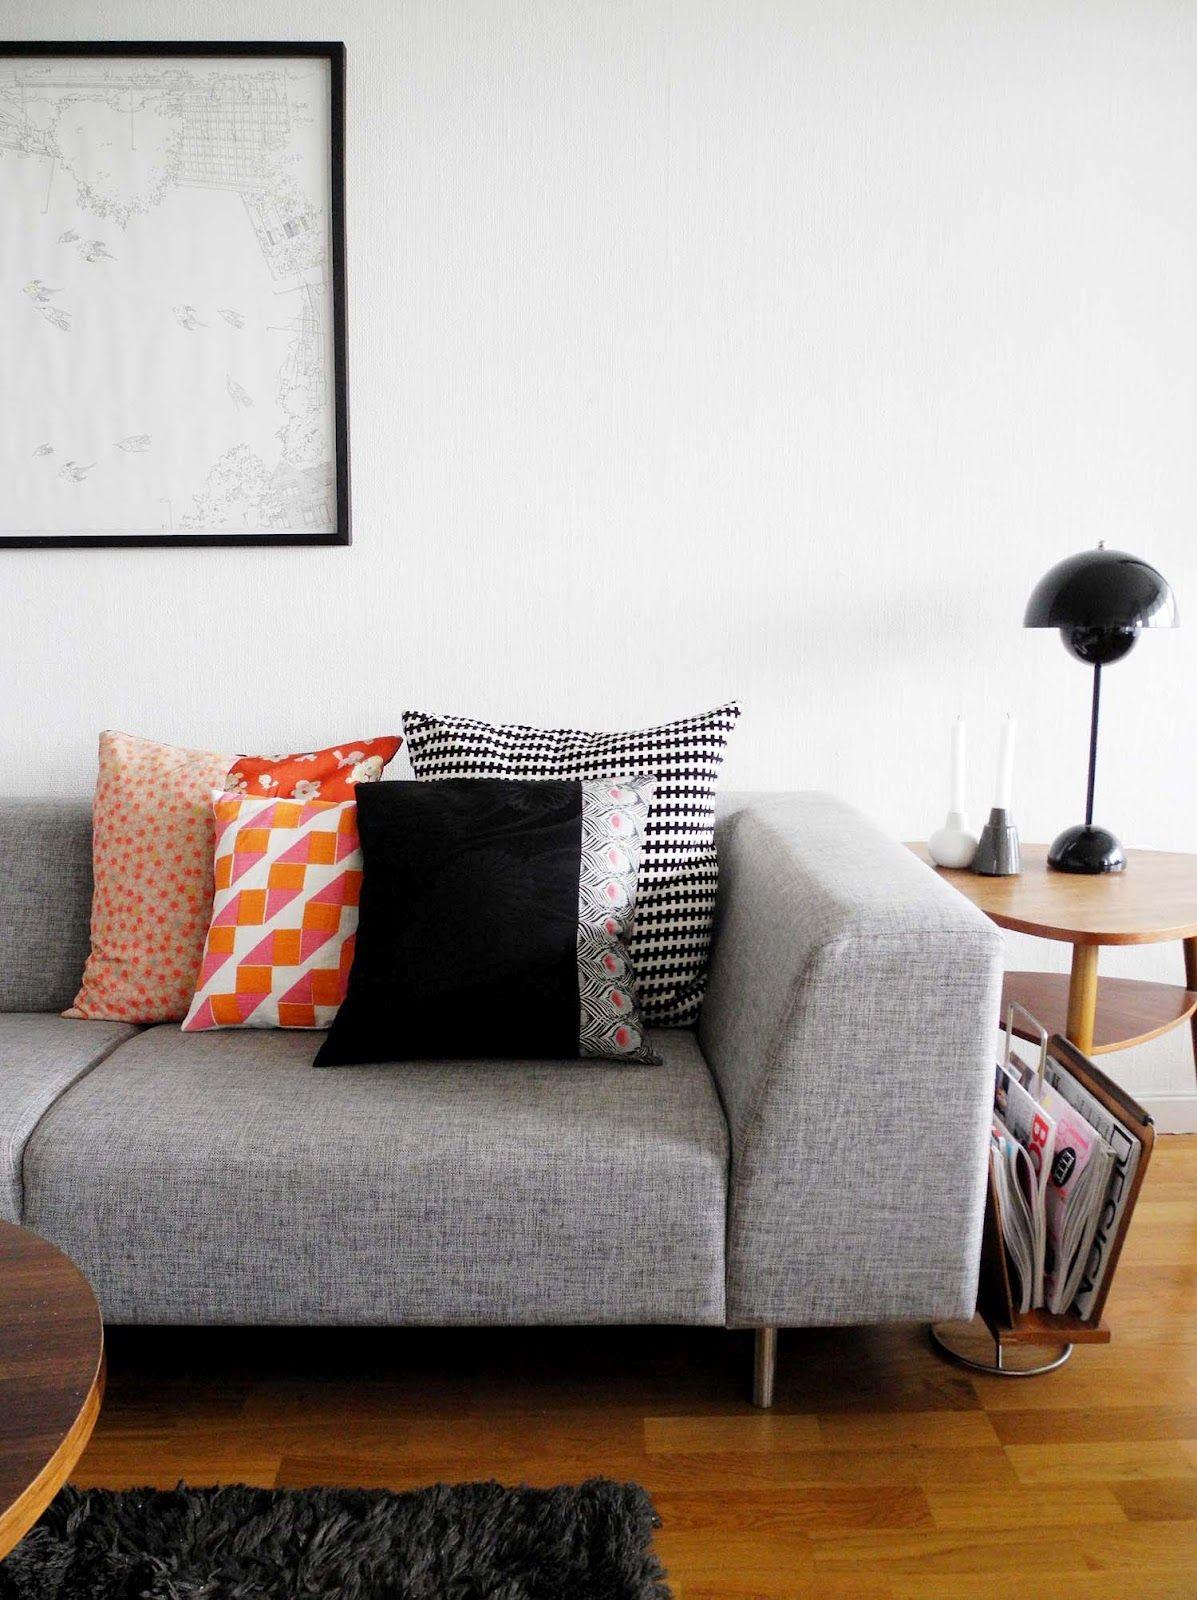 Babyramen textiles cushions made from kimono fabric couches